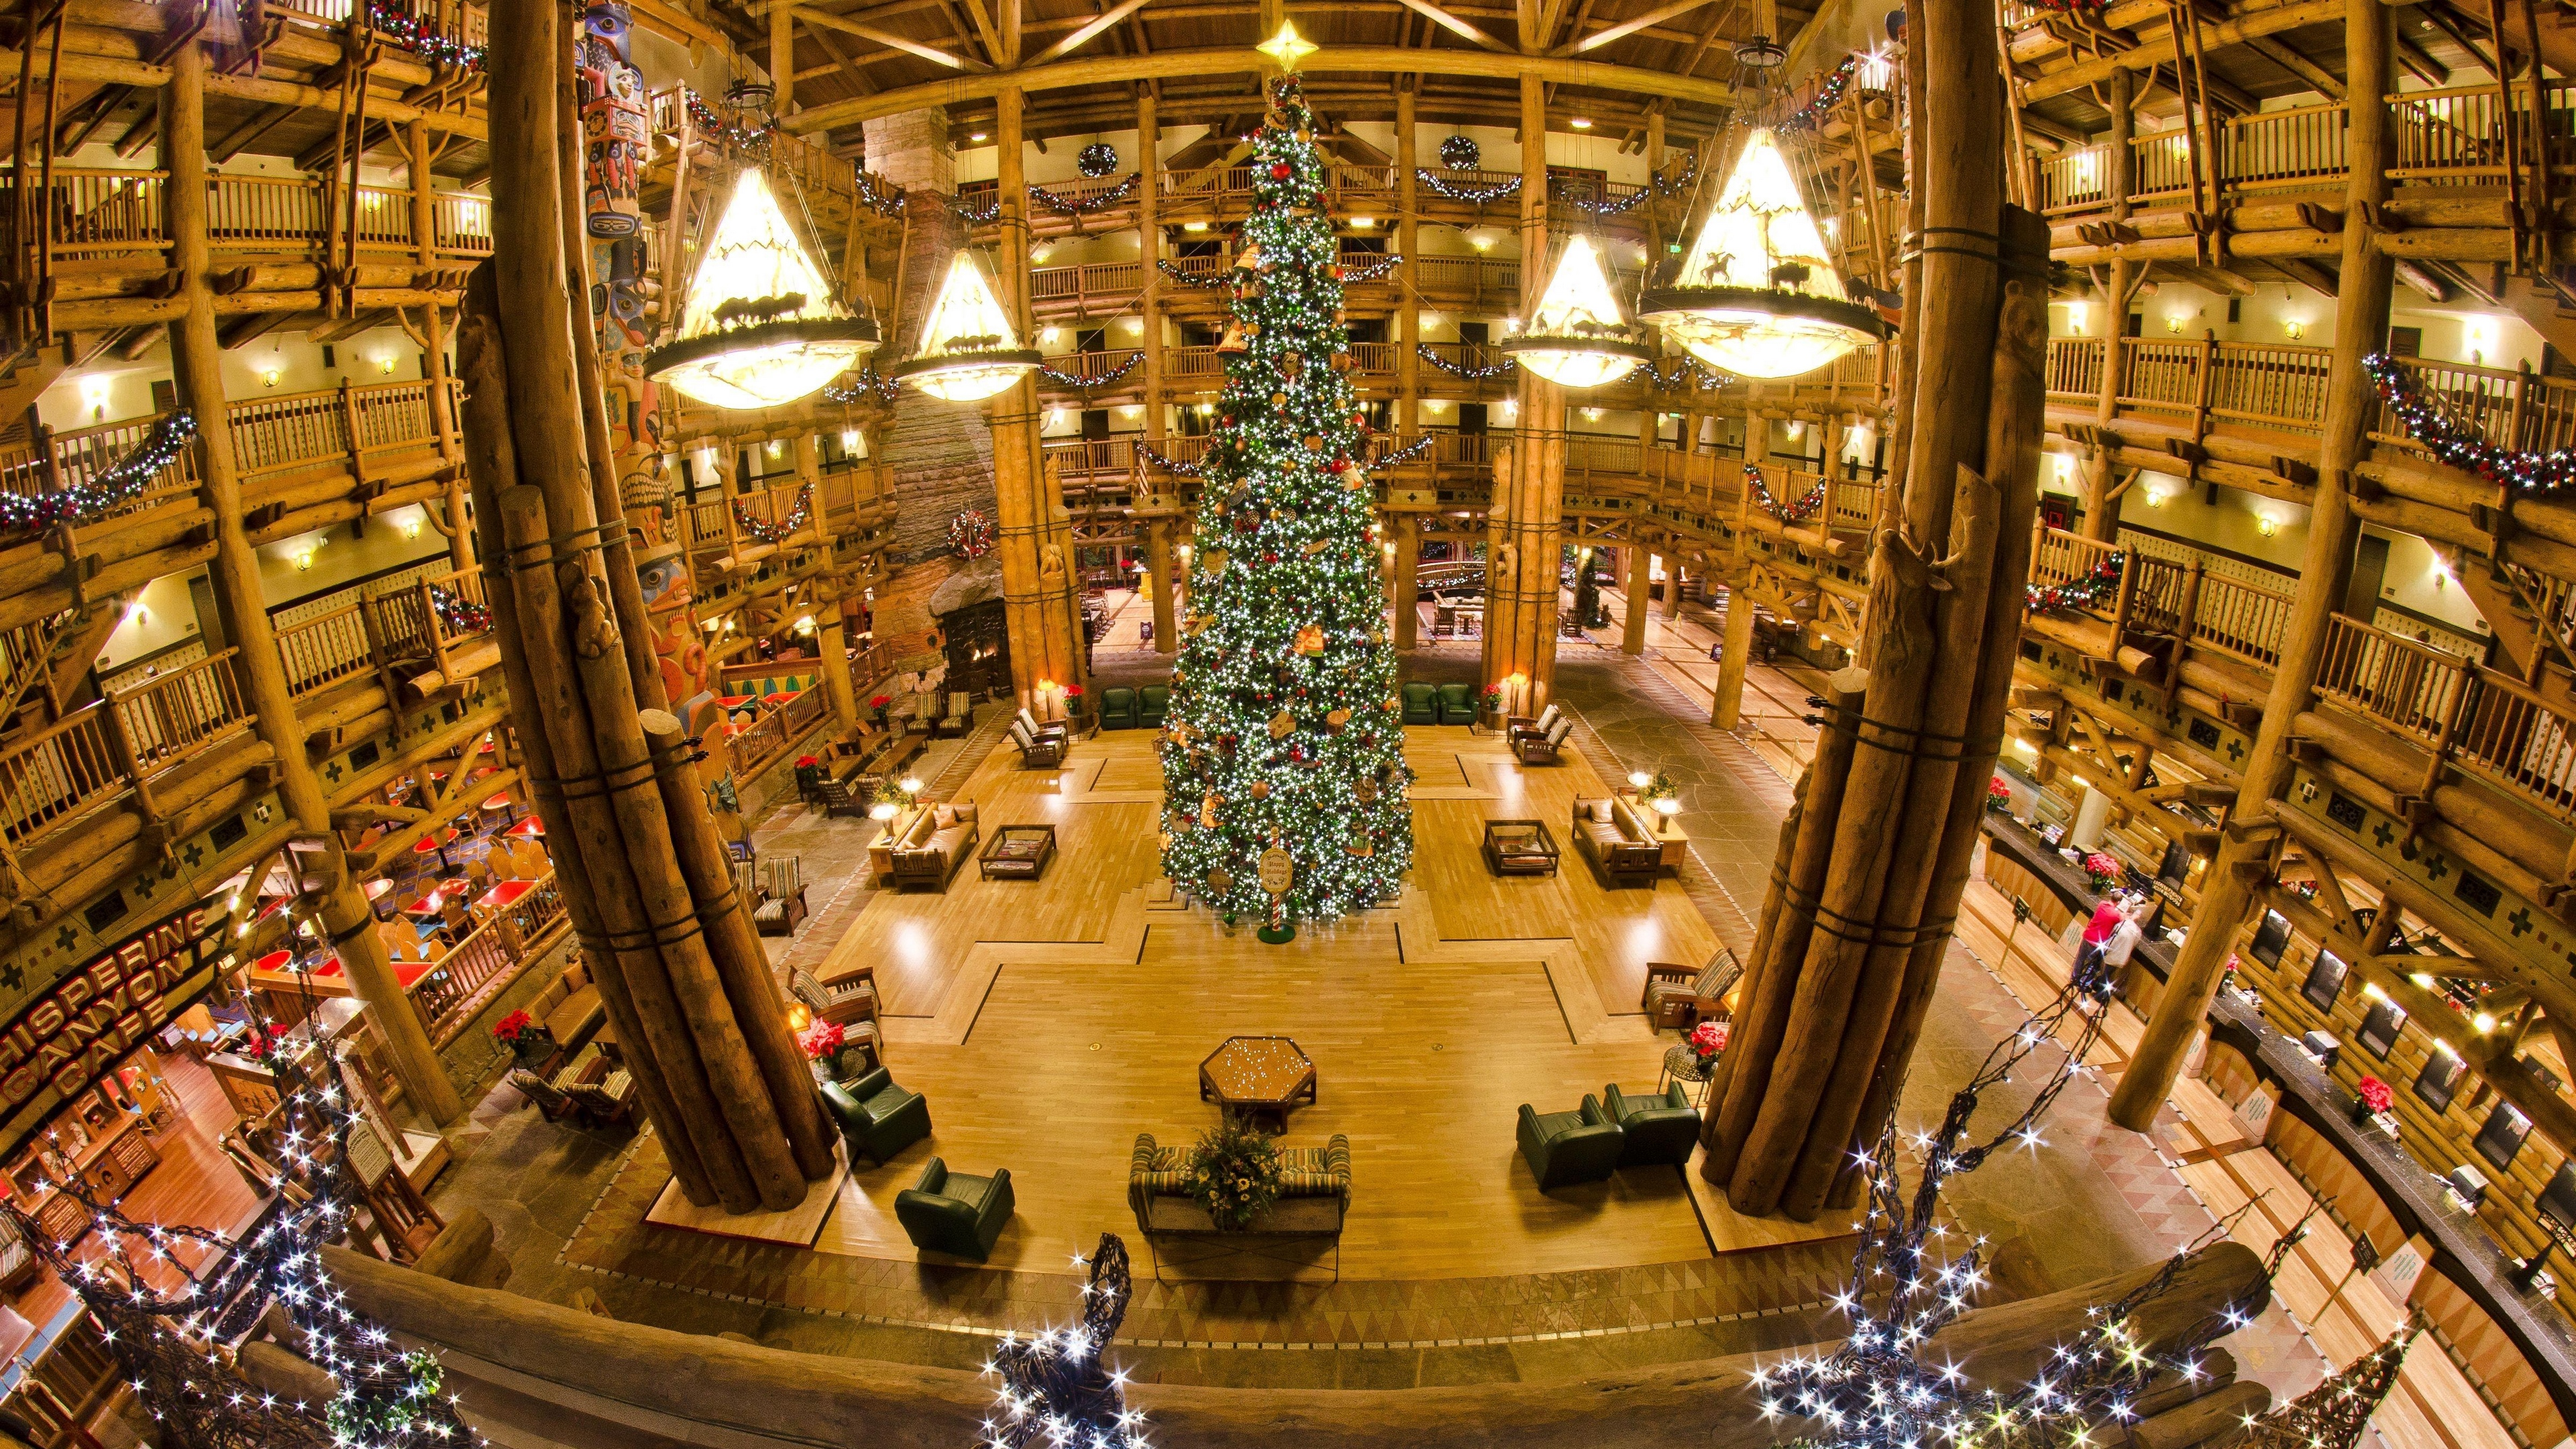 new year christmas tree holiday living room mood store vanity 4k 1538344731 - new year, christmas, tree, holiday, living room, mood, store, vanity 4k - tree, new year, Christmas